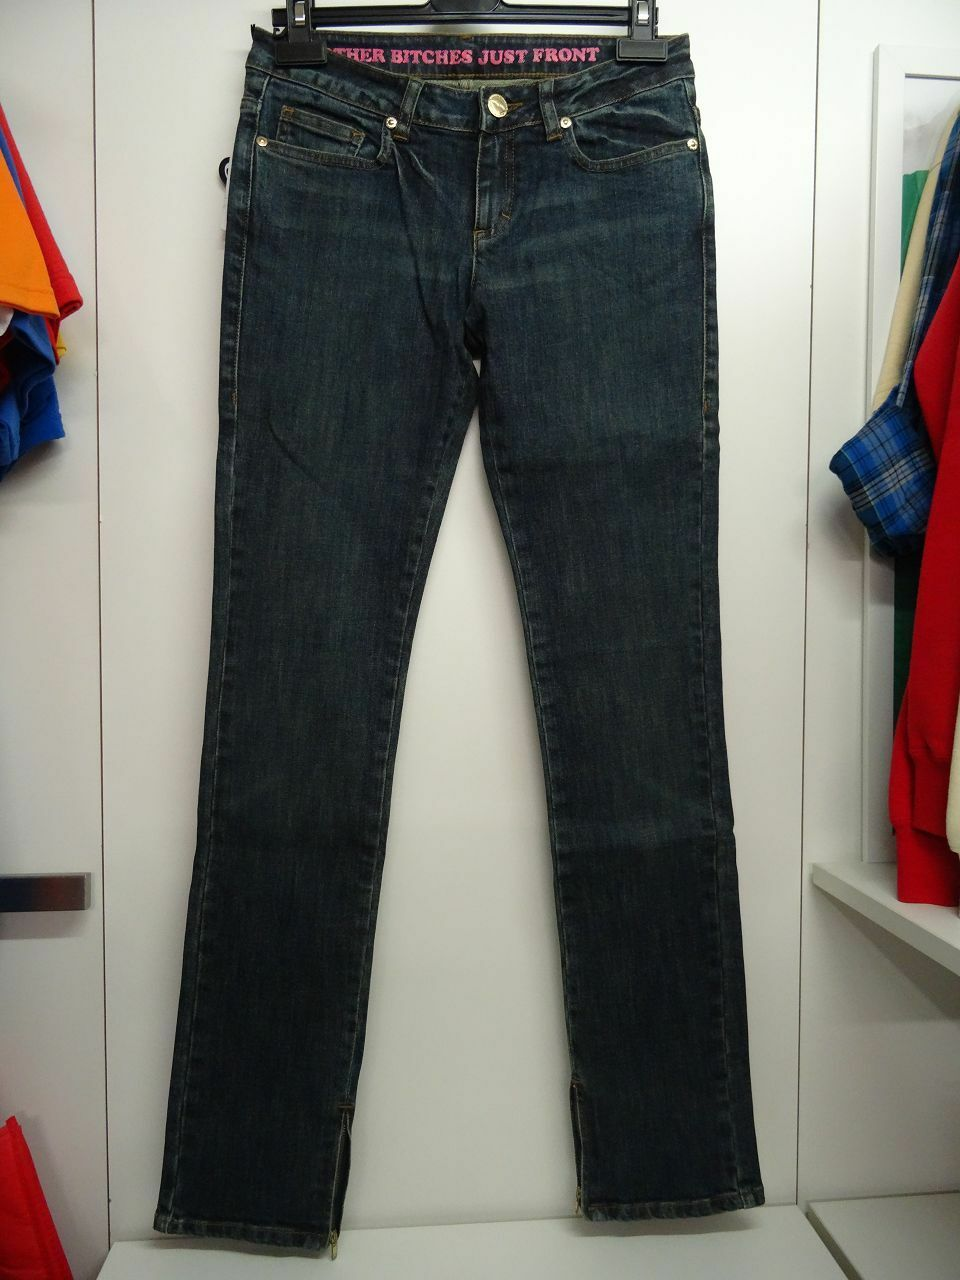 Married to the MOB W Jeans blau Hose Damen Girls Skater NEU Frauen Sk8 Jeanshose